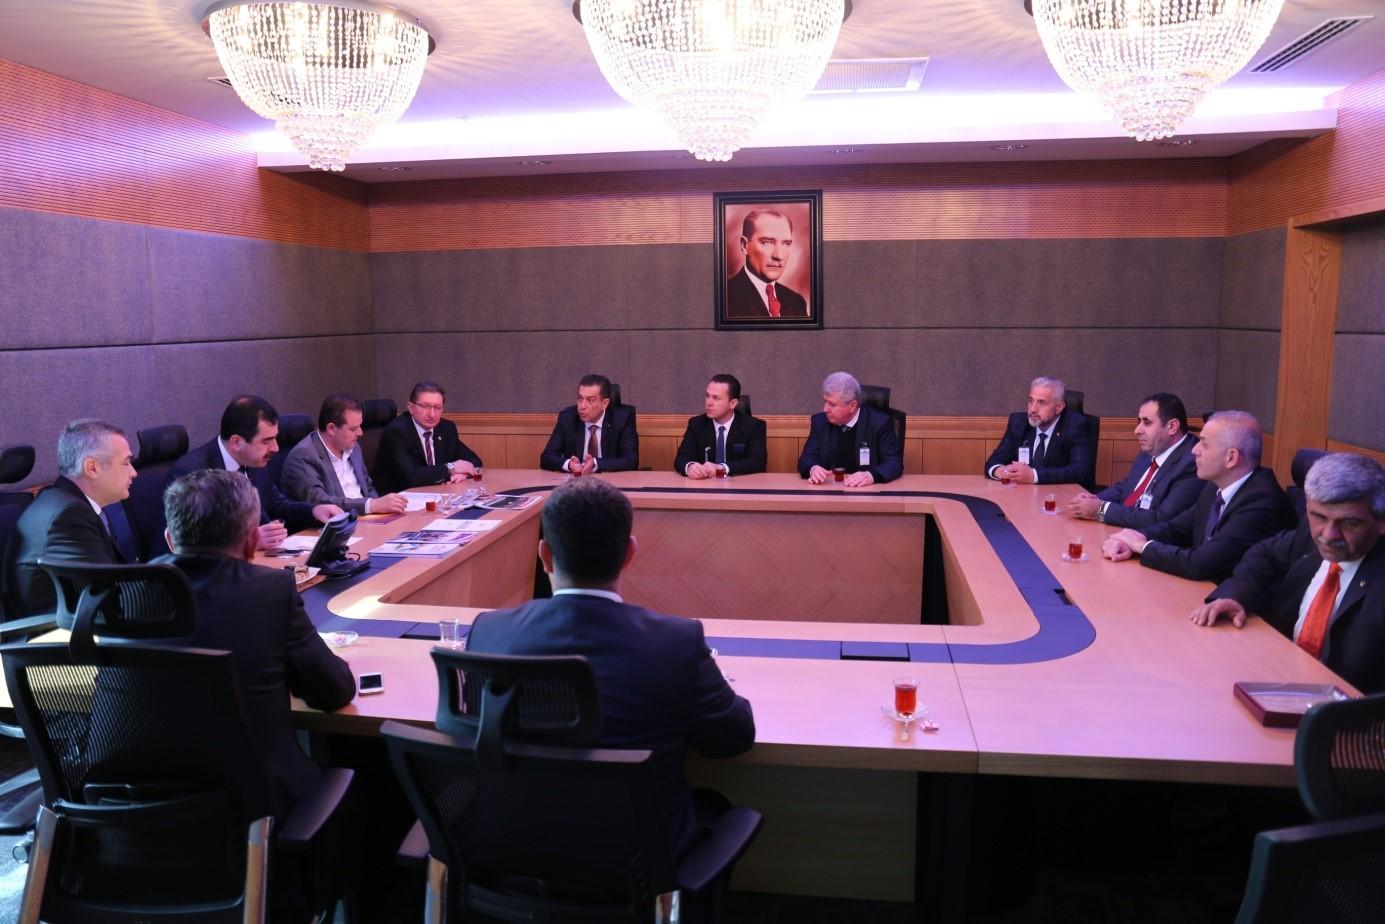 20151203-aydin-milletvekilleri-ile-toplanti